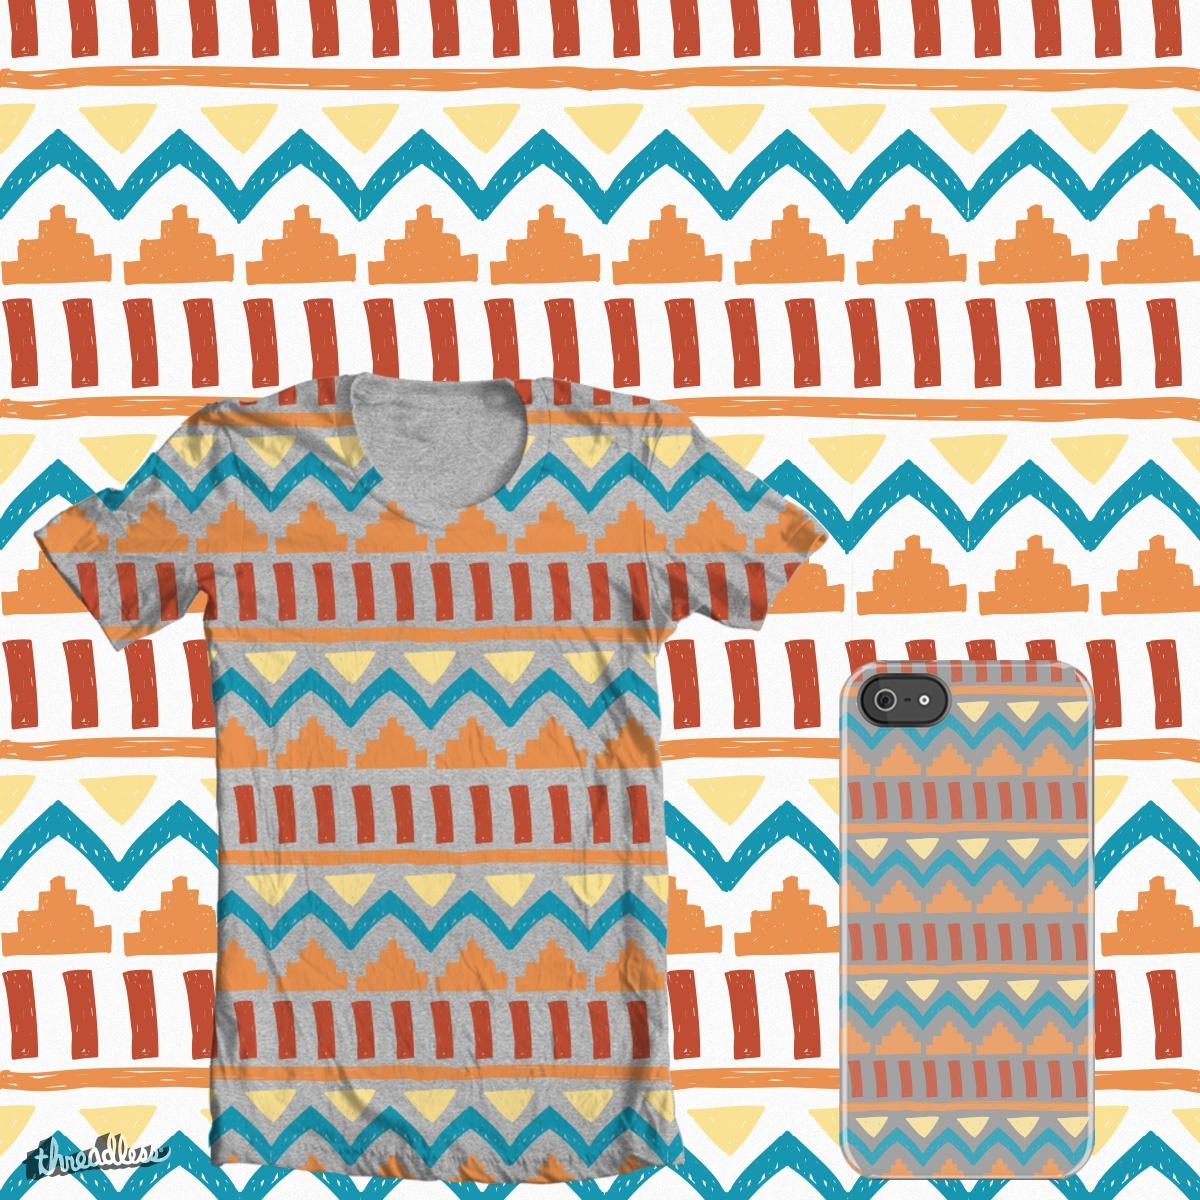 Aztec Pattern by JEMcintosh on Threadless